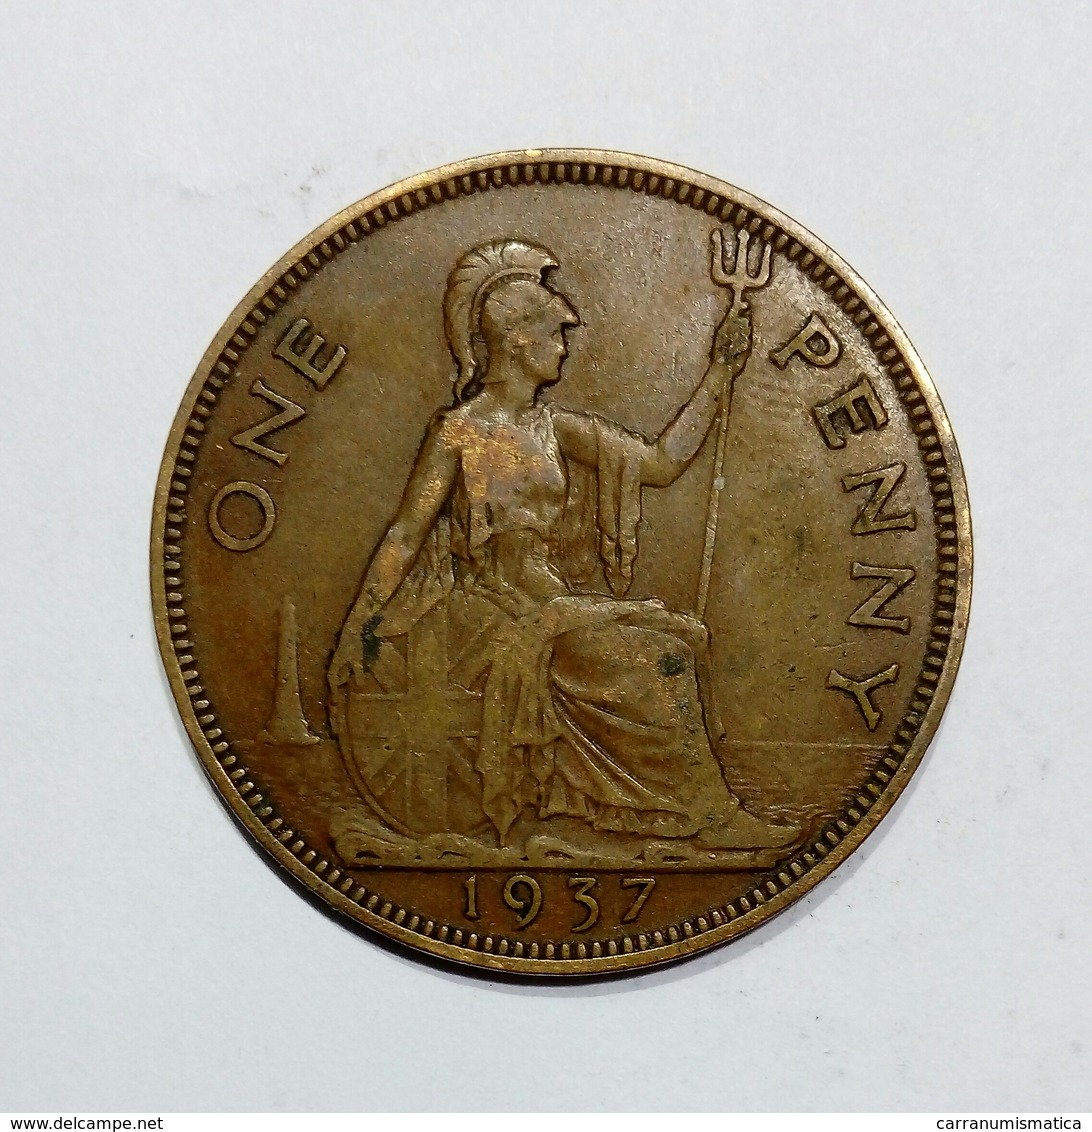 GREAT BRITAIN / GRAN BRETAGNA - One Penny ( 1937 ) GEORGE VI - D. 1 Penny